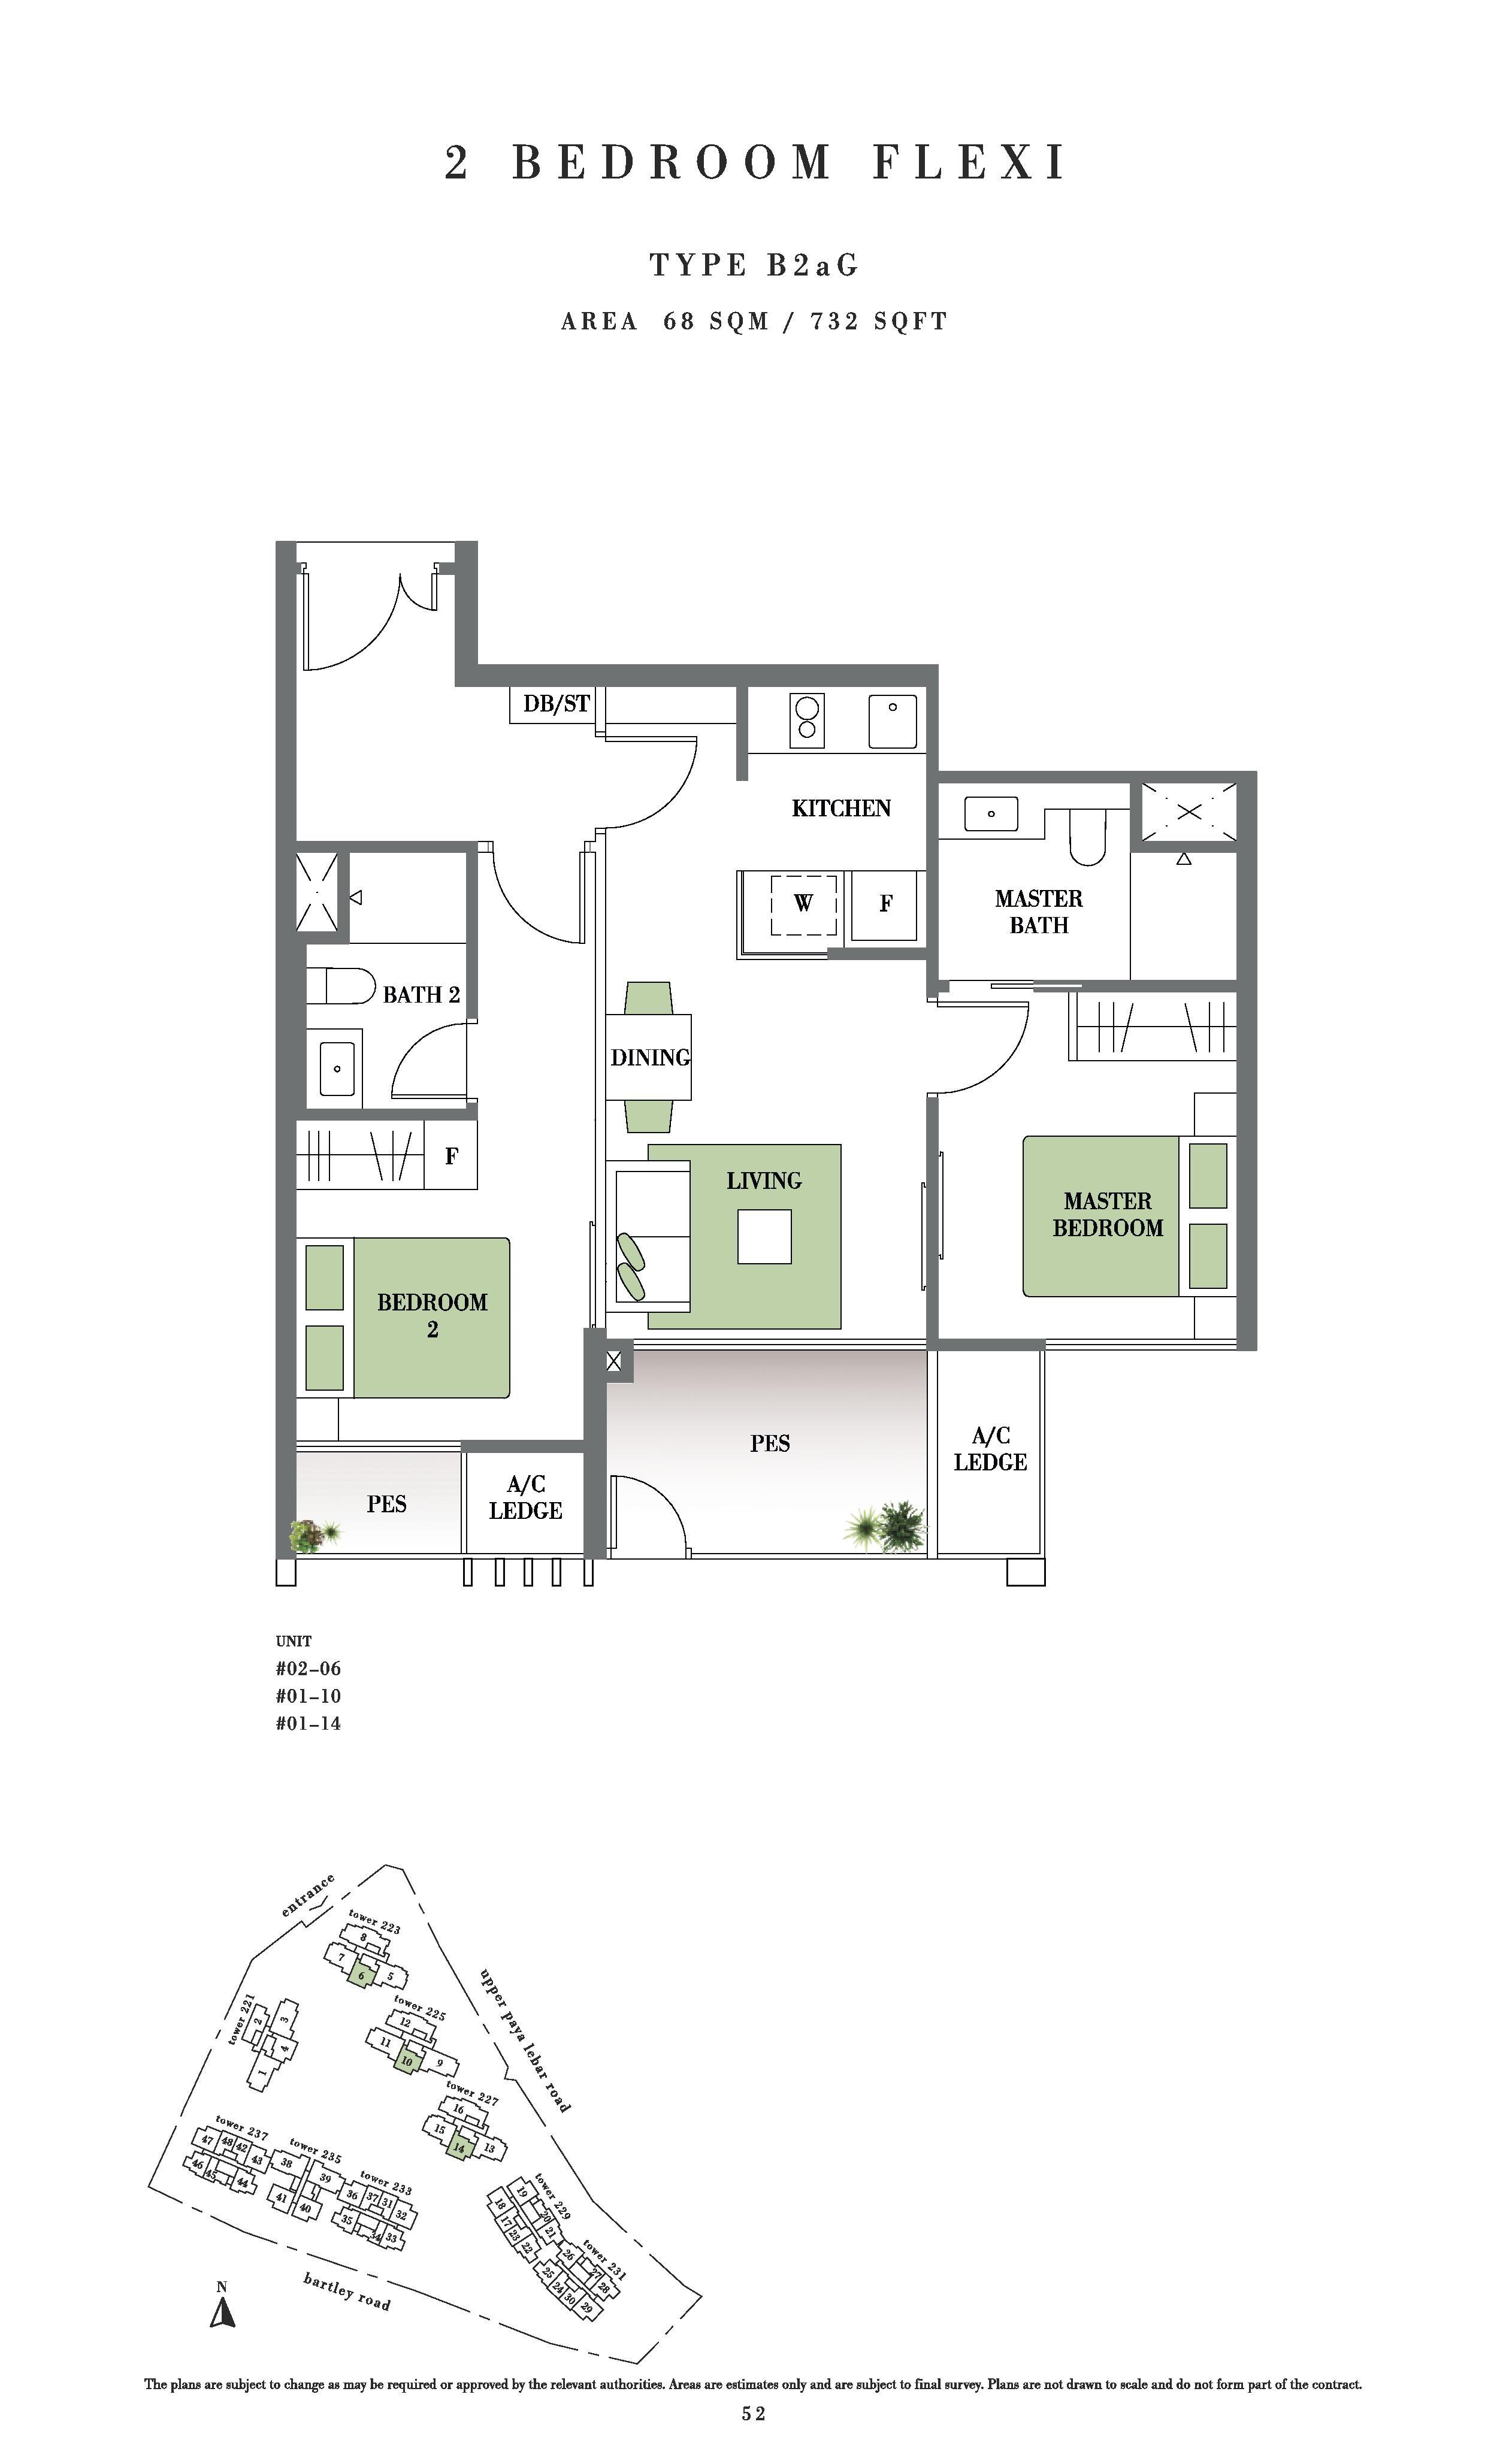 Botanique @ Bartley 2 Bedroom Flexi PES Floor Plans Type B2aG